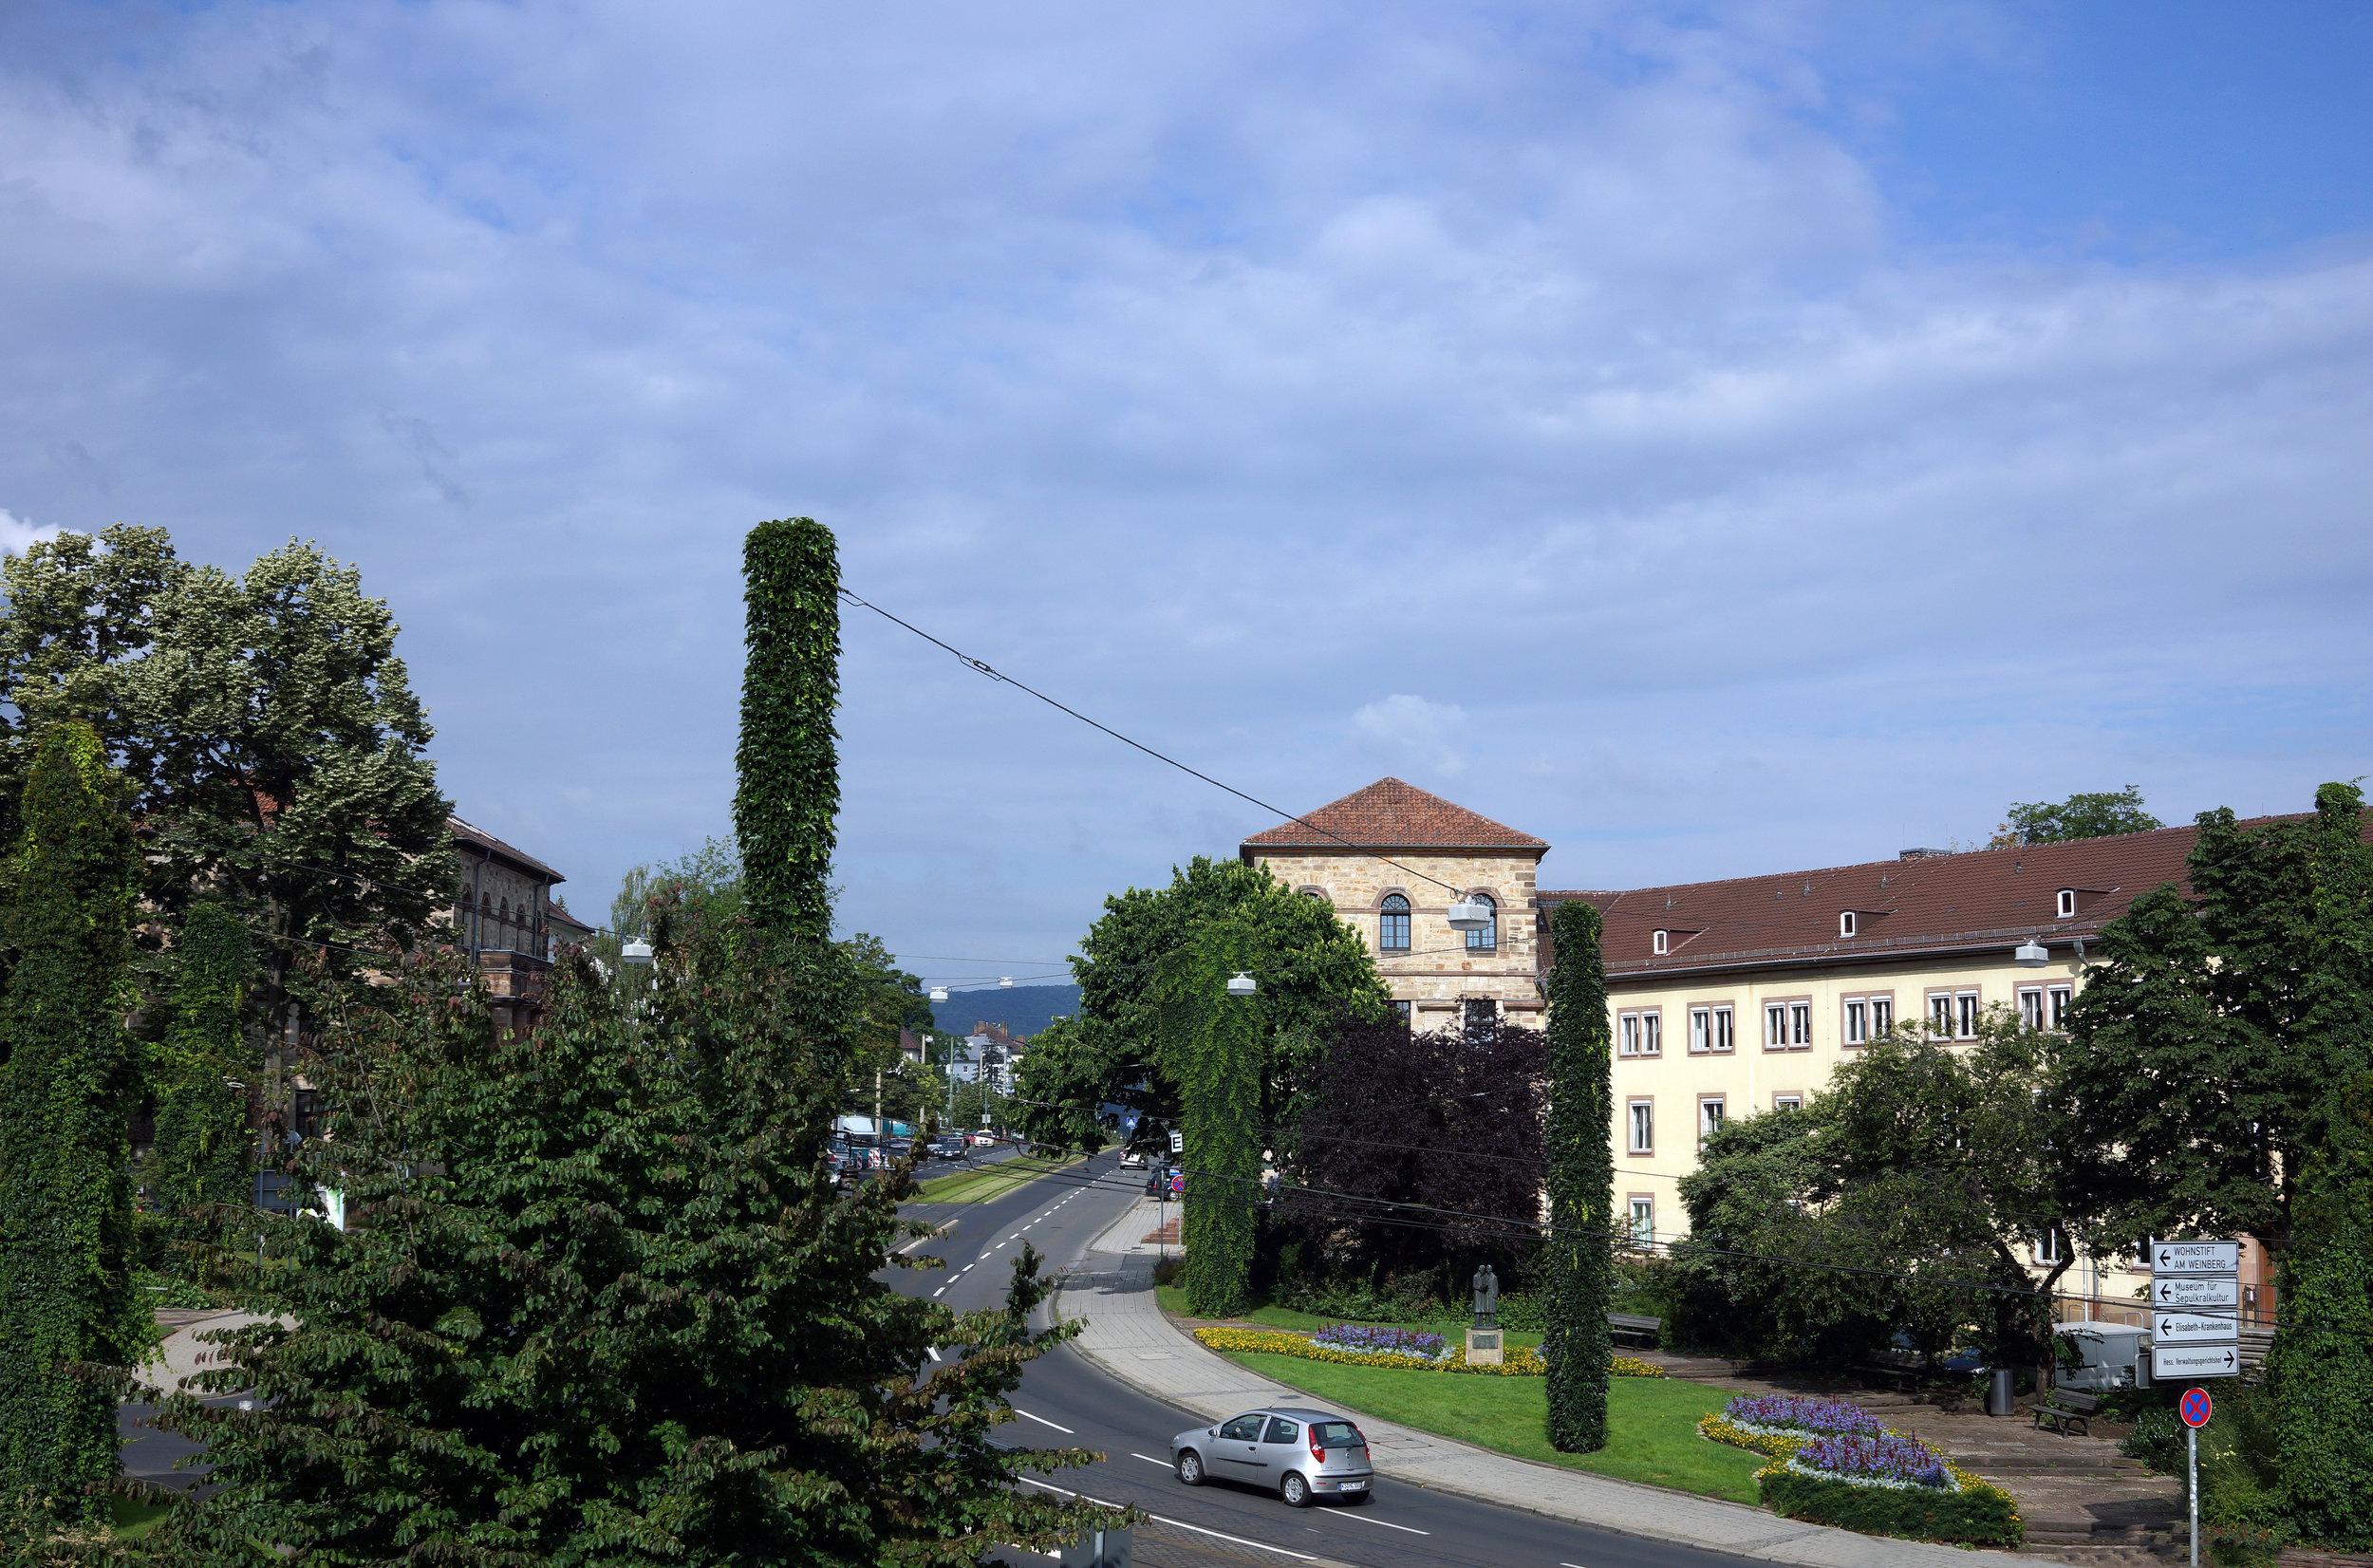 Grand City Hotel Hessenland, Kassel Zentrum, Germany, Room 222, $202.41